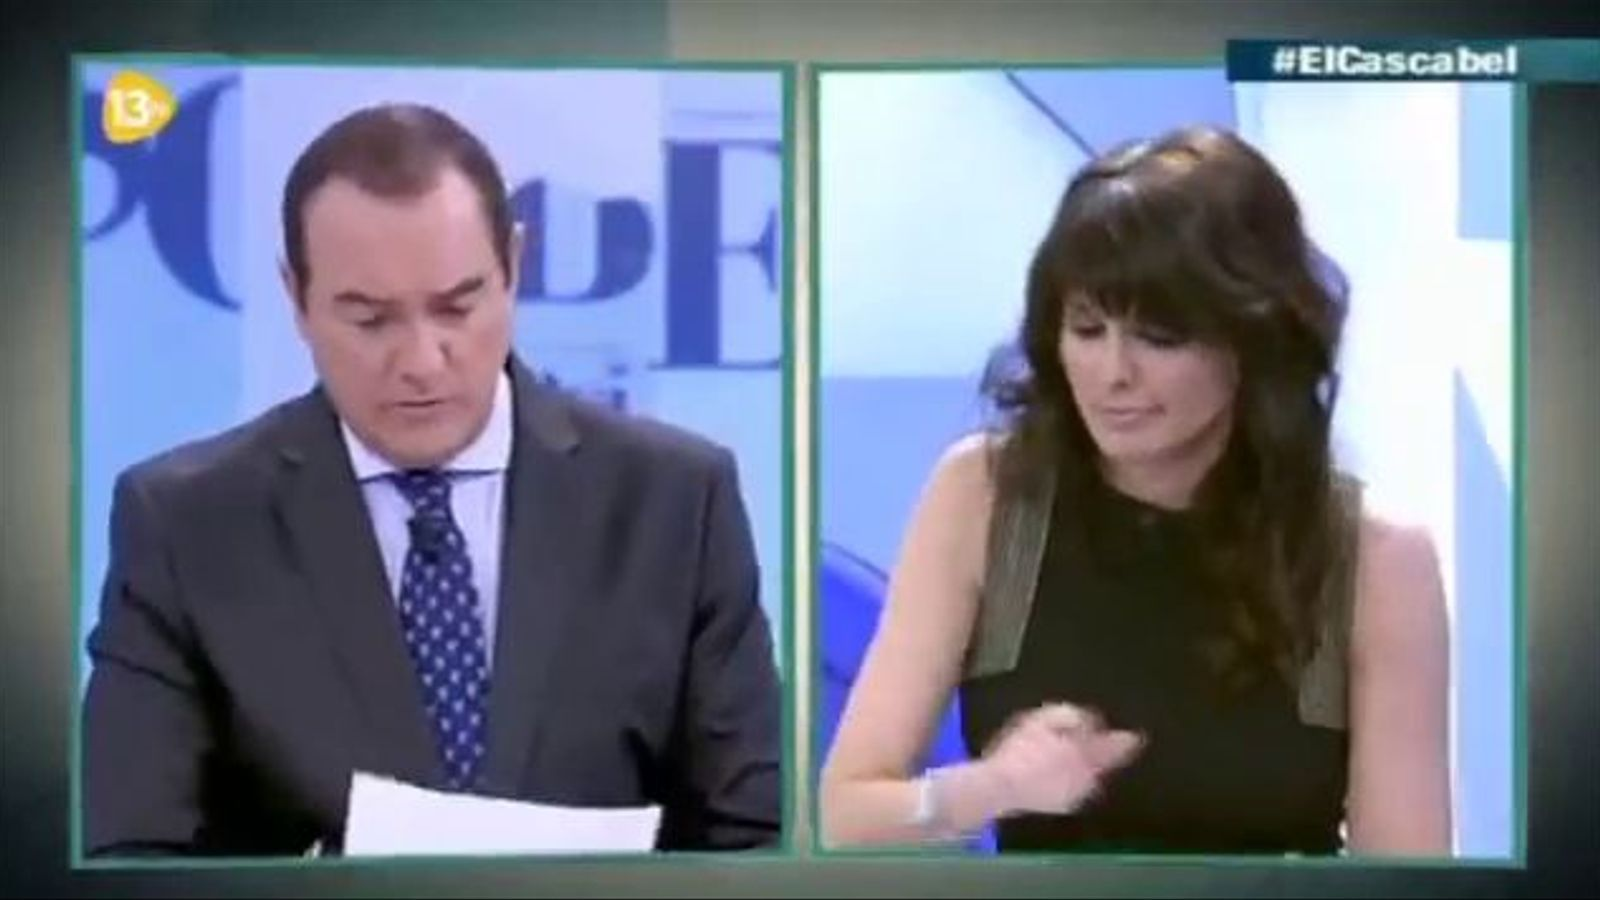 La tertúlia de 13tv sobre el tuit de Jair Domínguez